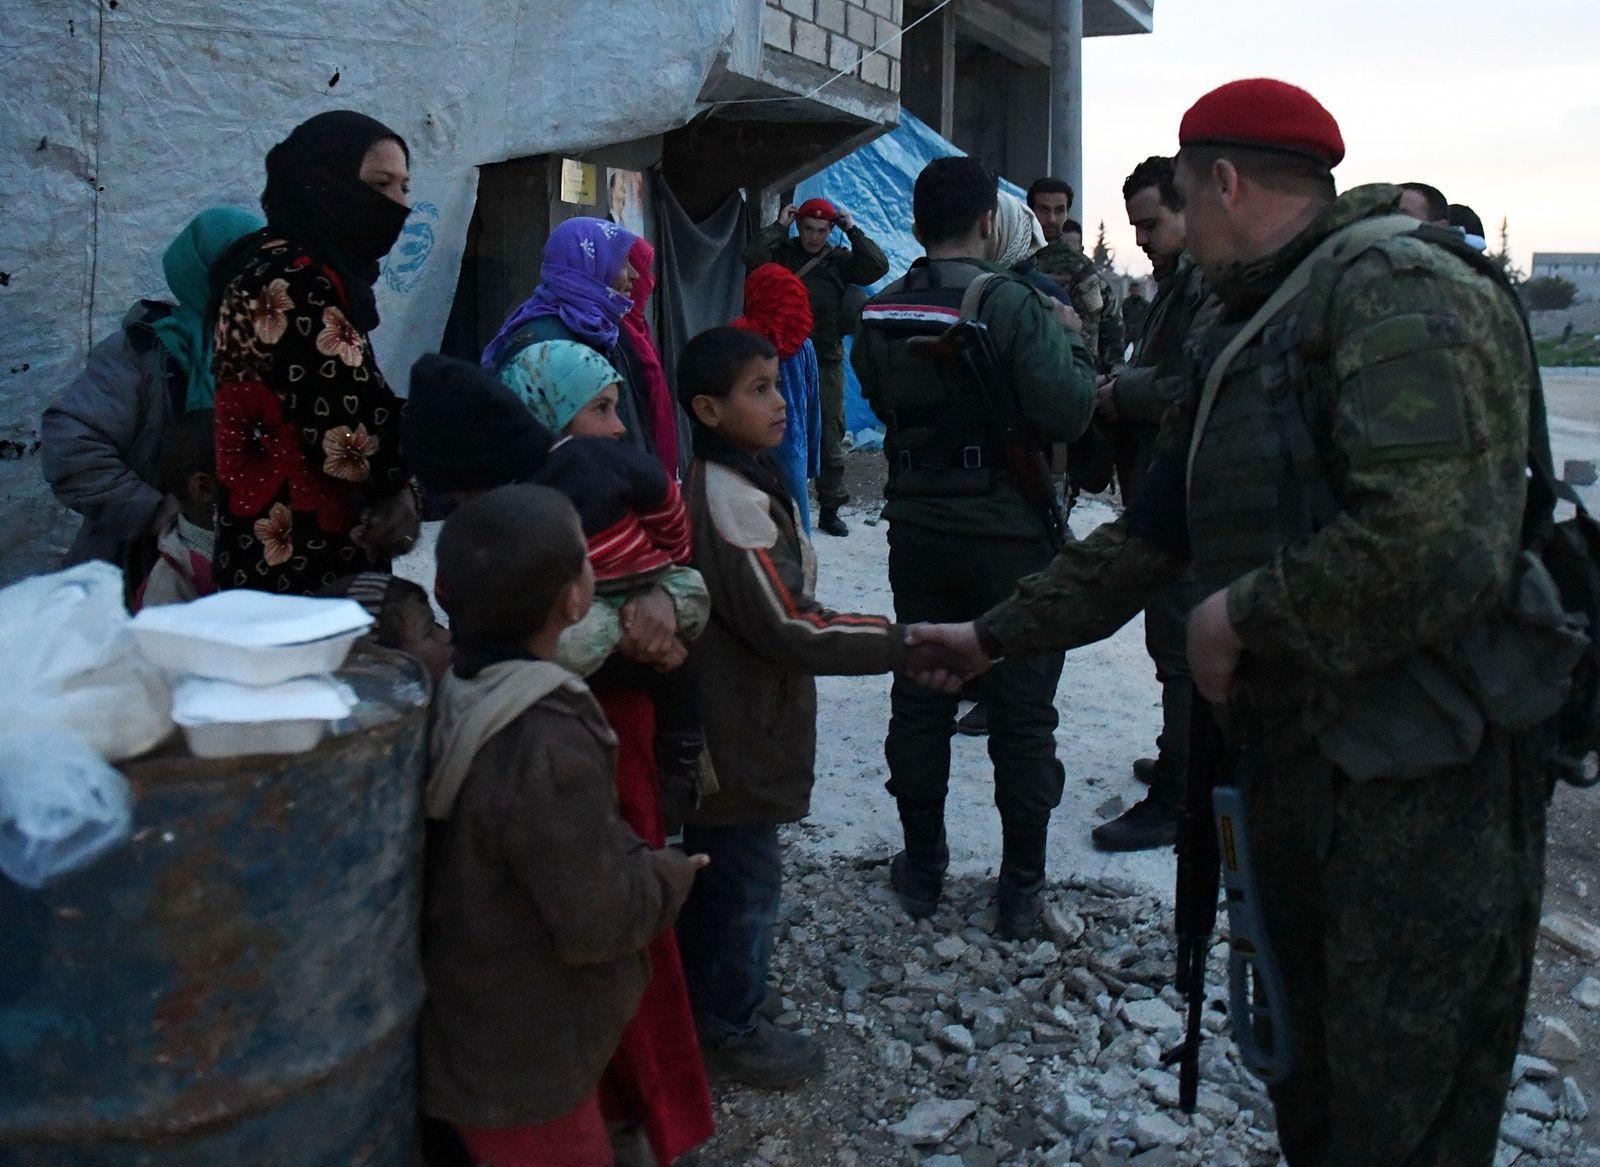 Syrien/ Russen/ Abu al-Duhur